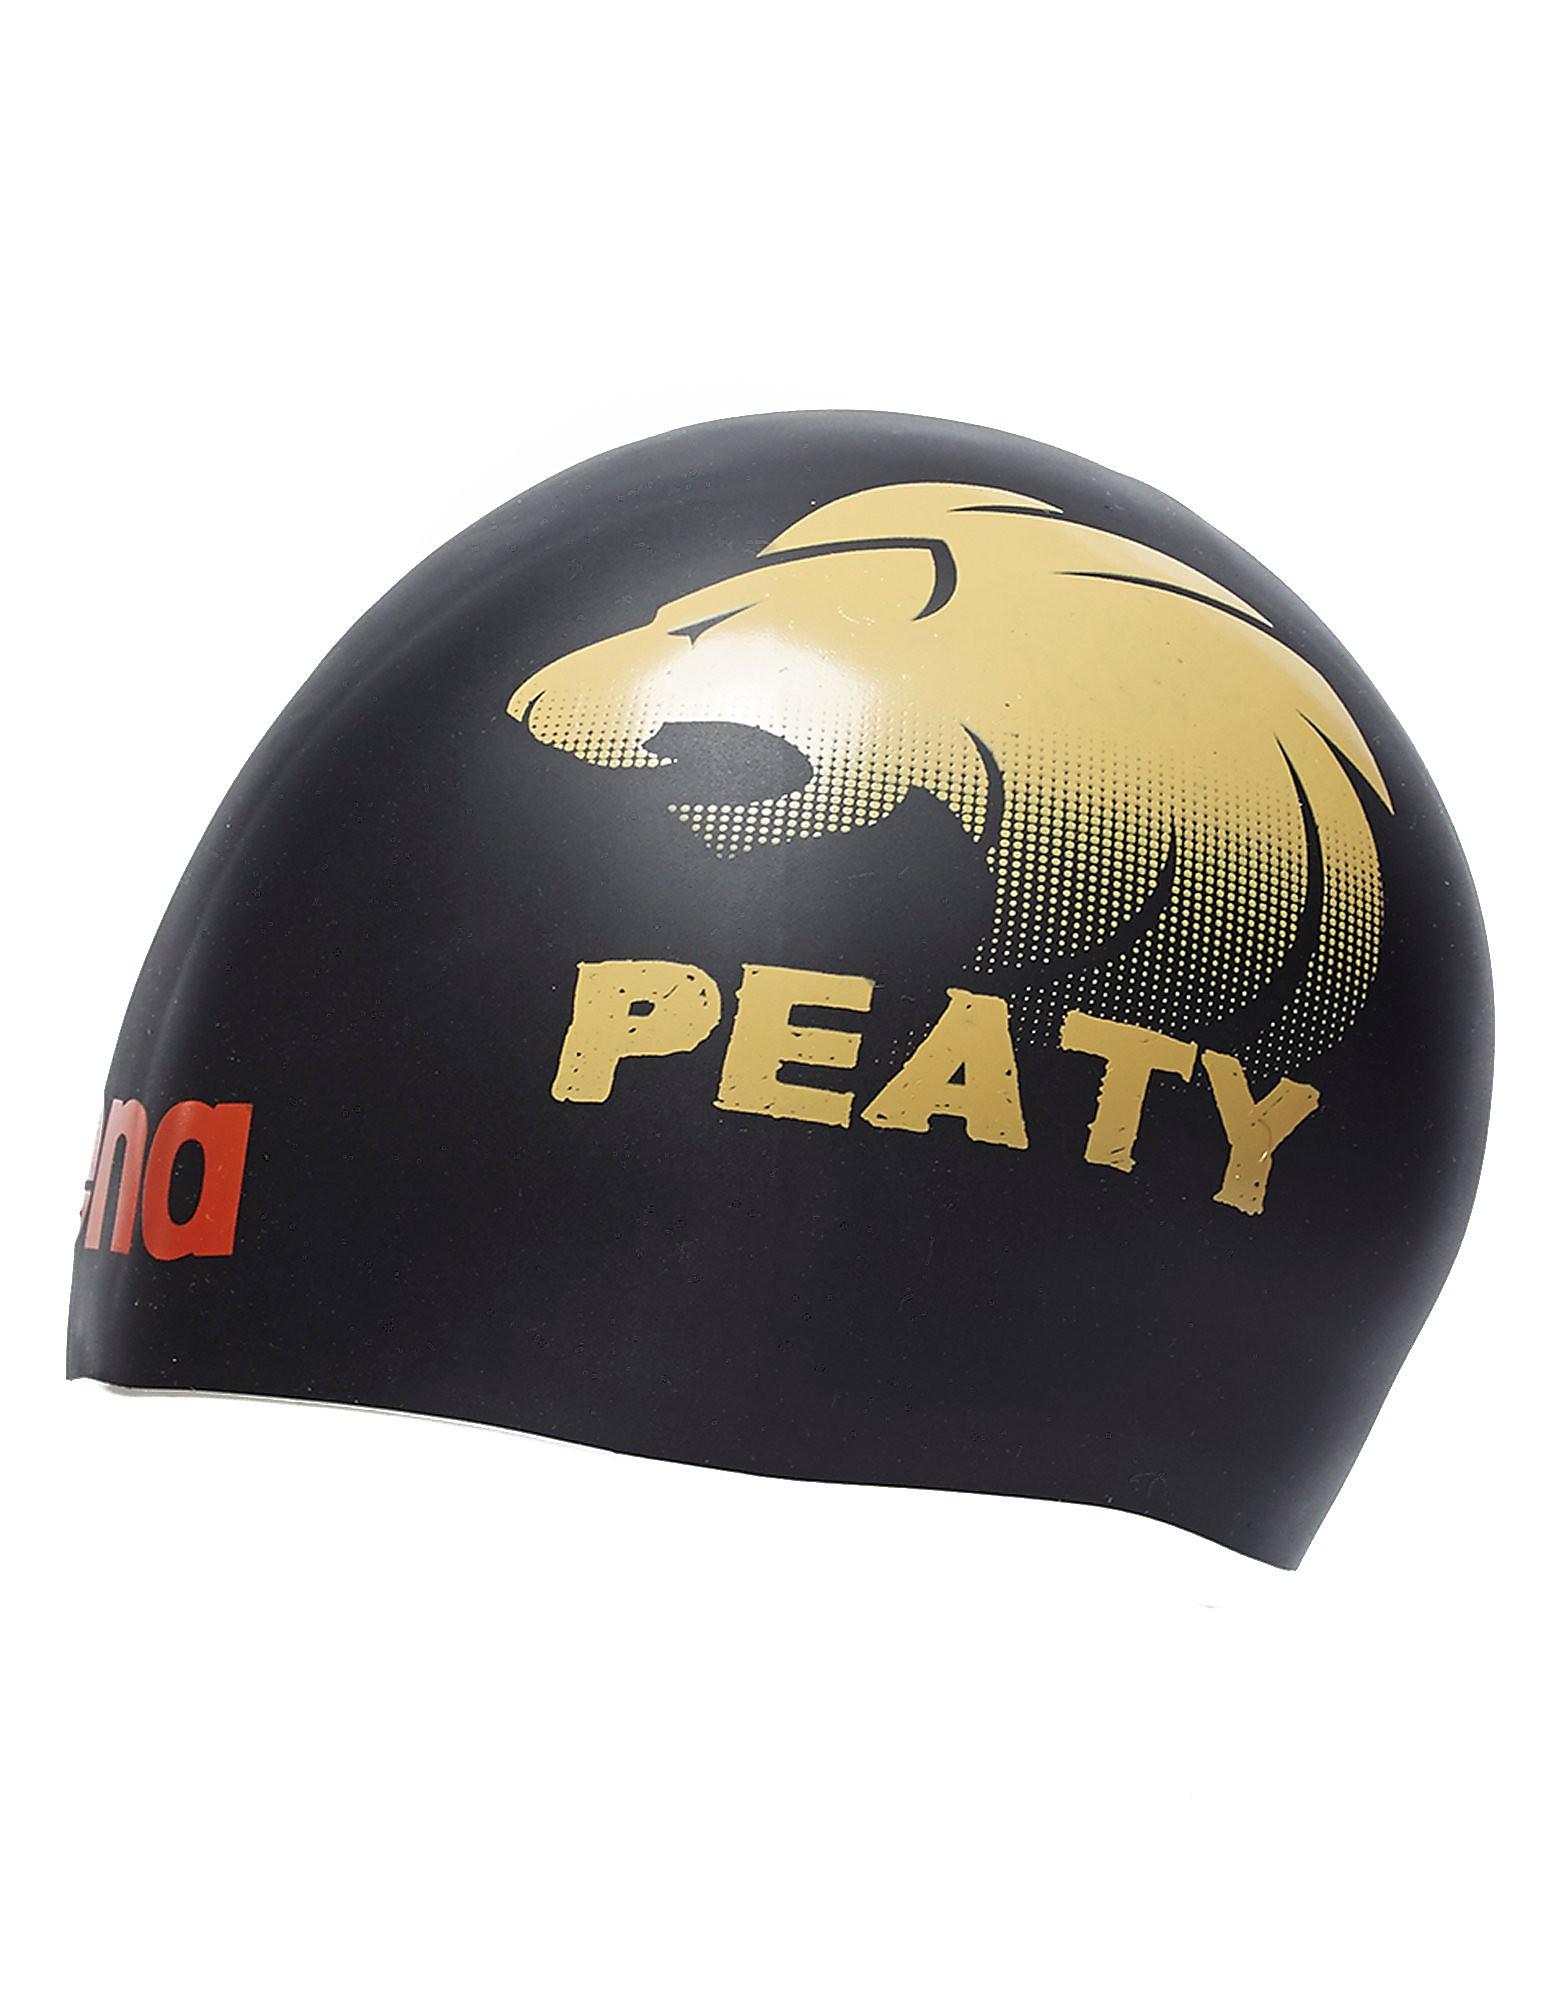 Arena Peaty Moulded Swim Cap